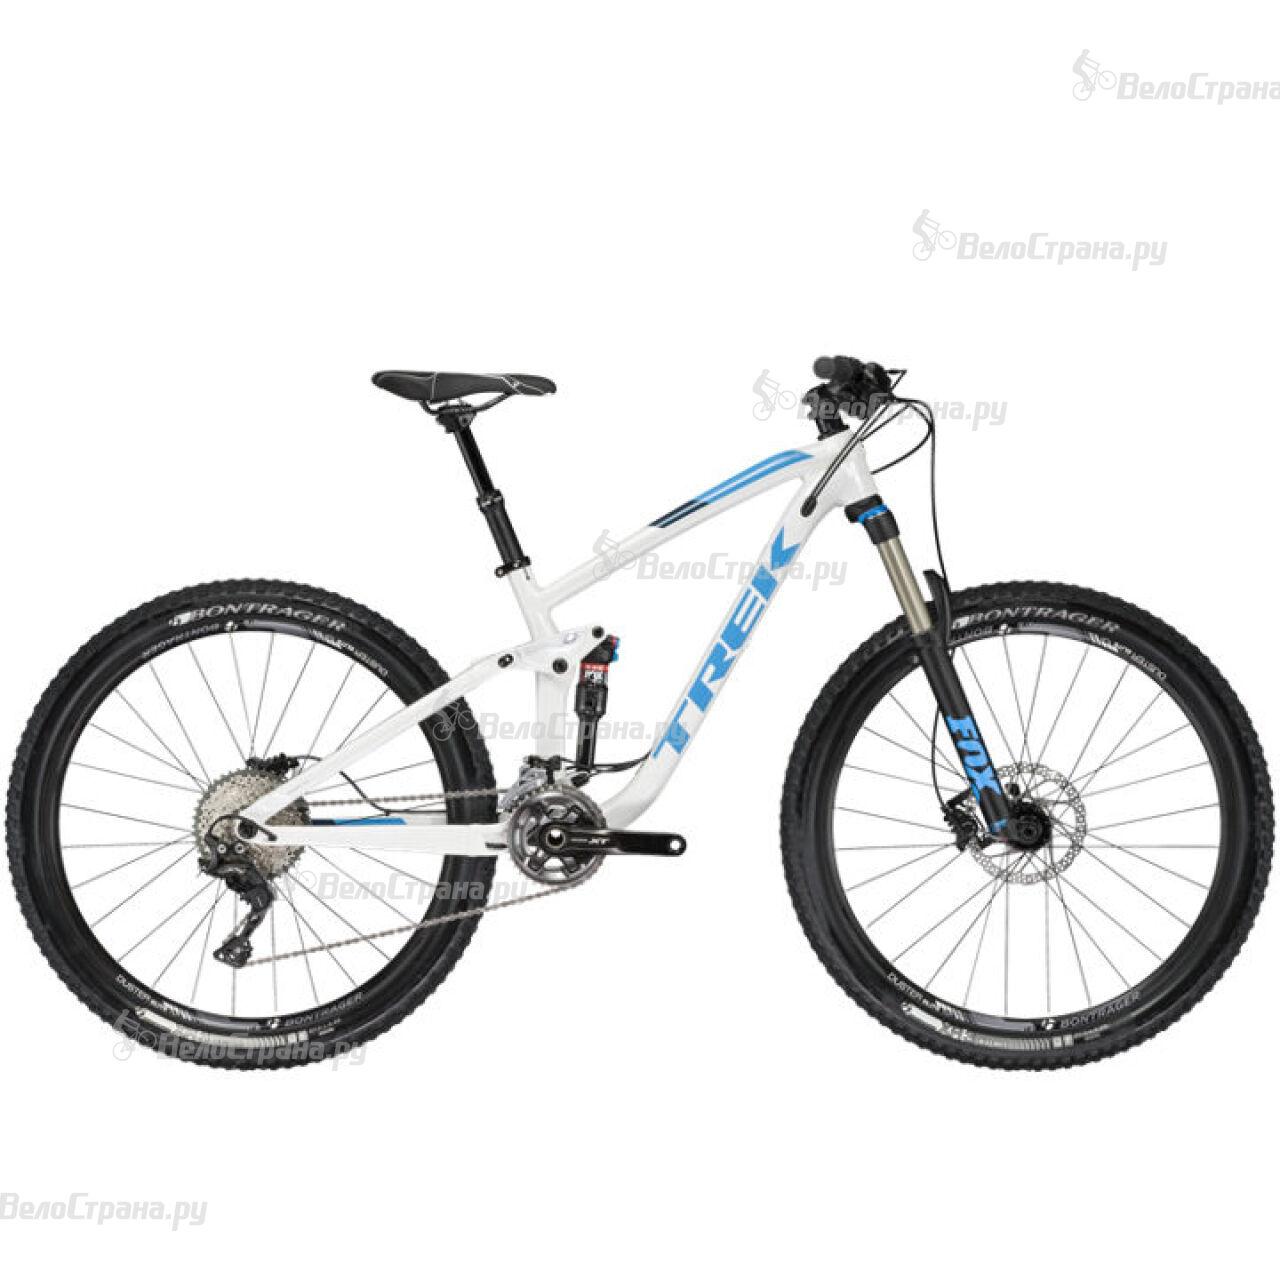 Велосипед Trek Fuel EX 8 WSD (2017) велосипед trek madone 3 1 wsd 2013